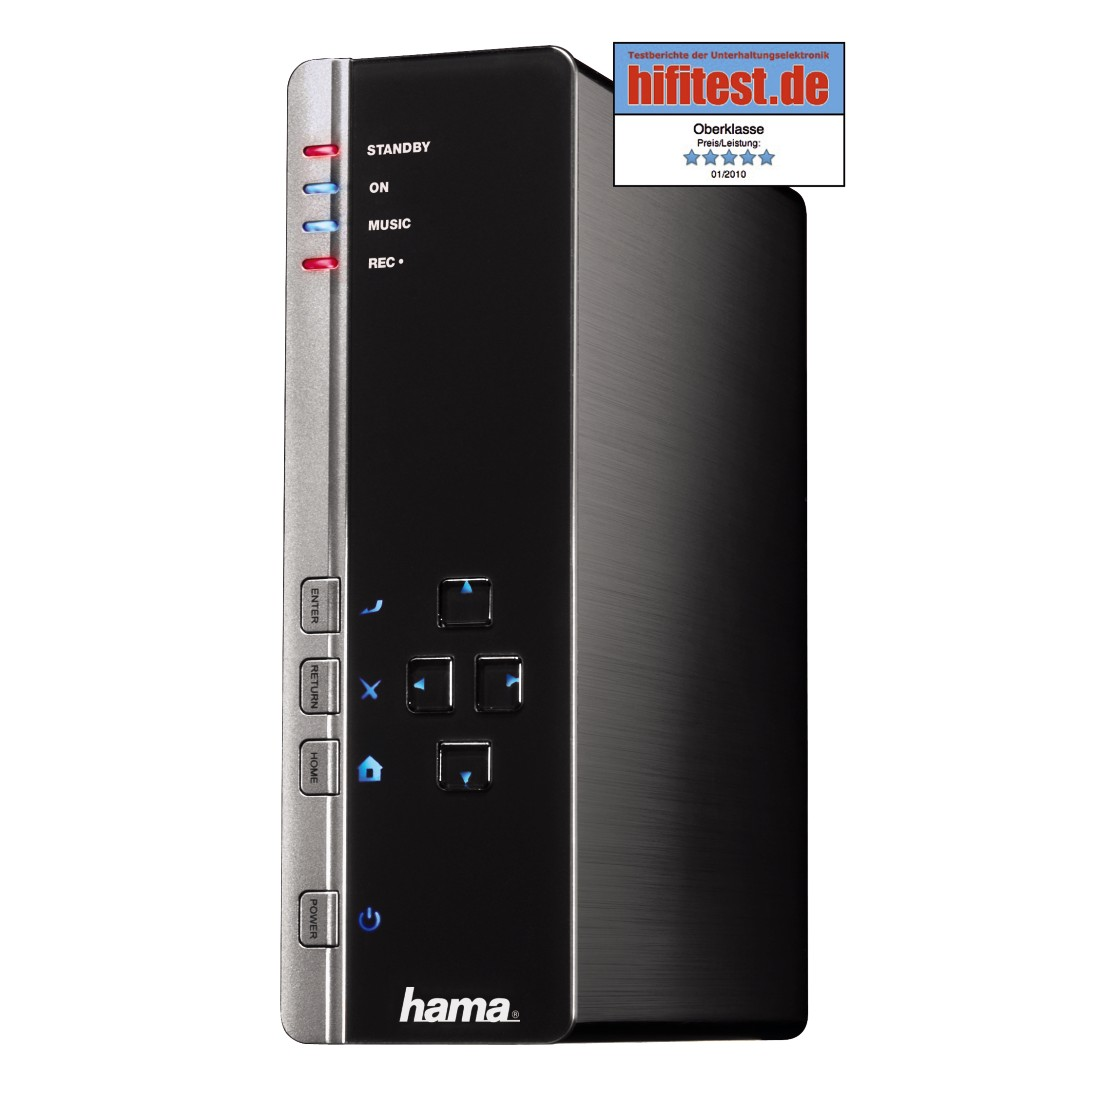 HAMA PRN 35 Media Station Driver for Mac Download